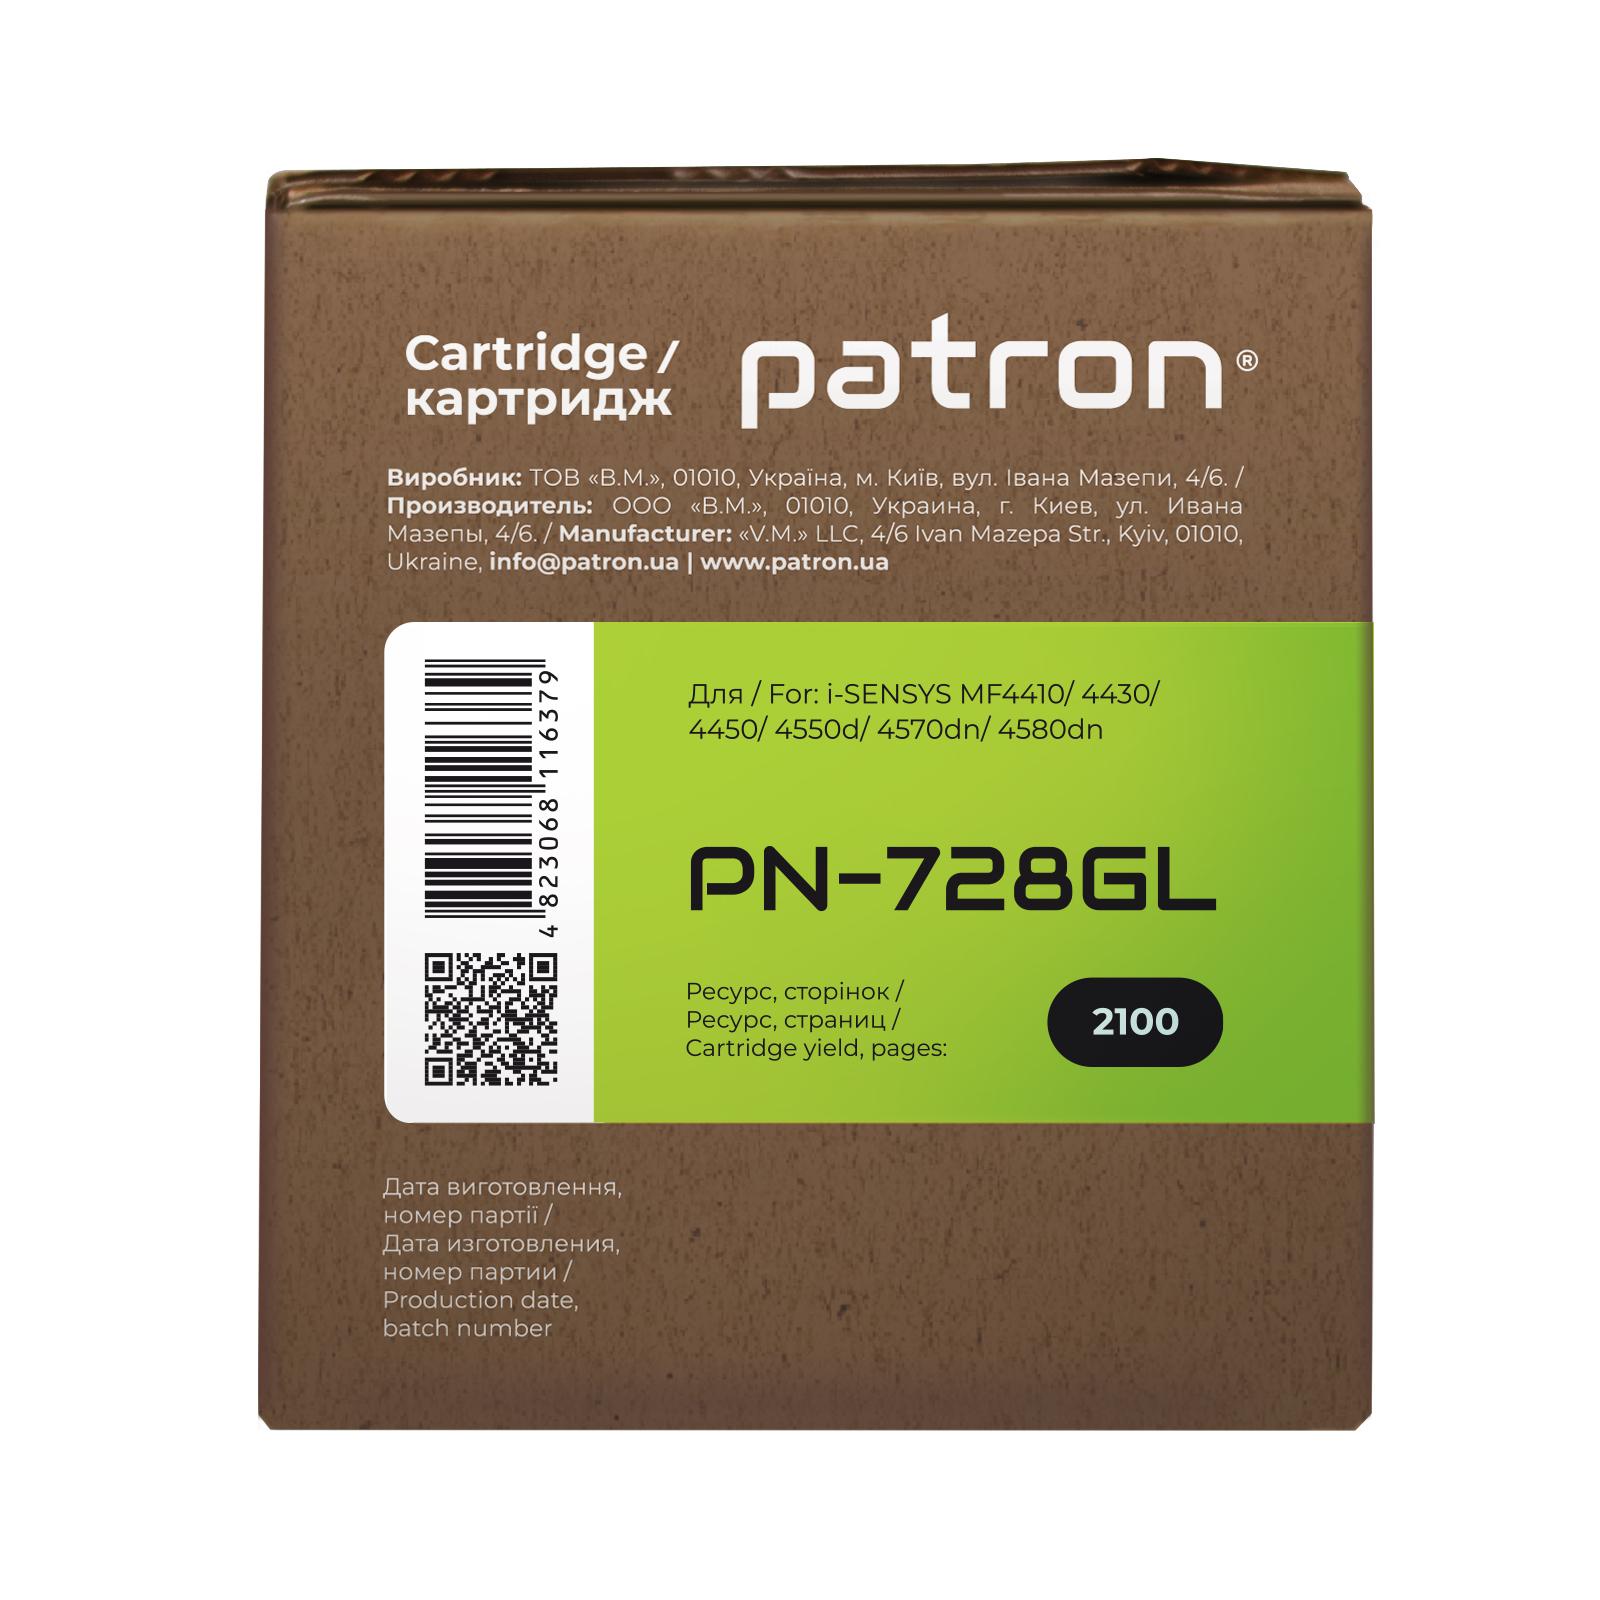 Картридж Patron CANON 728 GREEN Label (PN-728GL) изображение 3